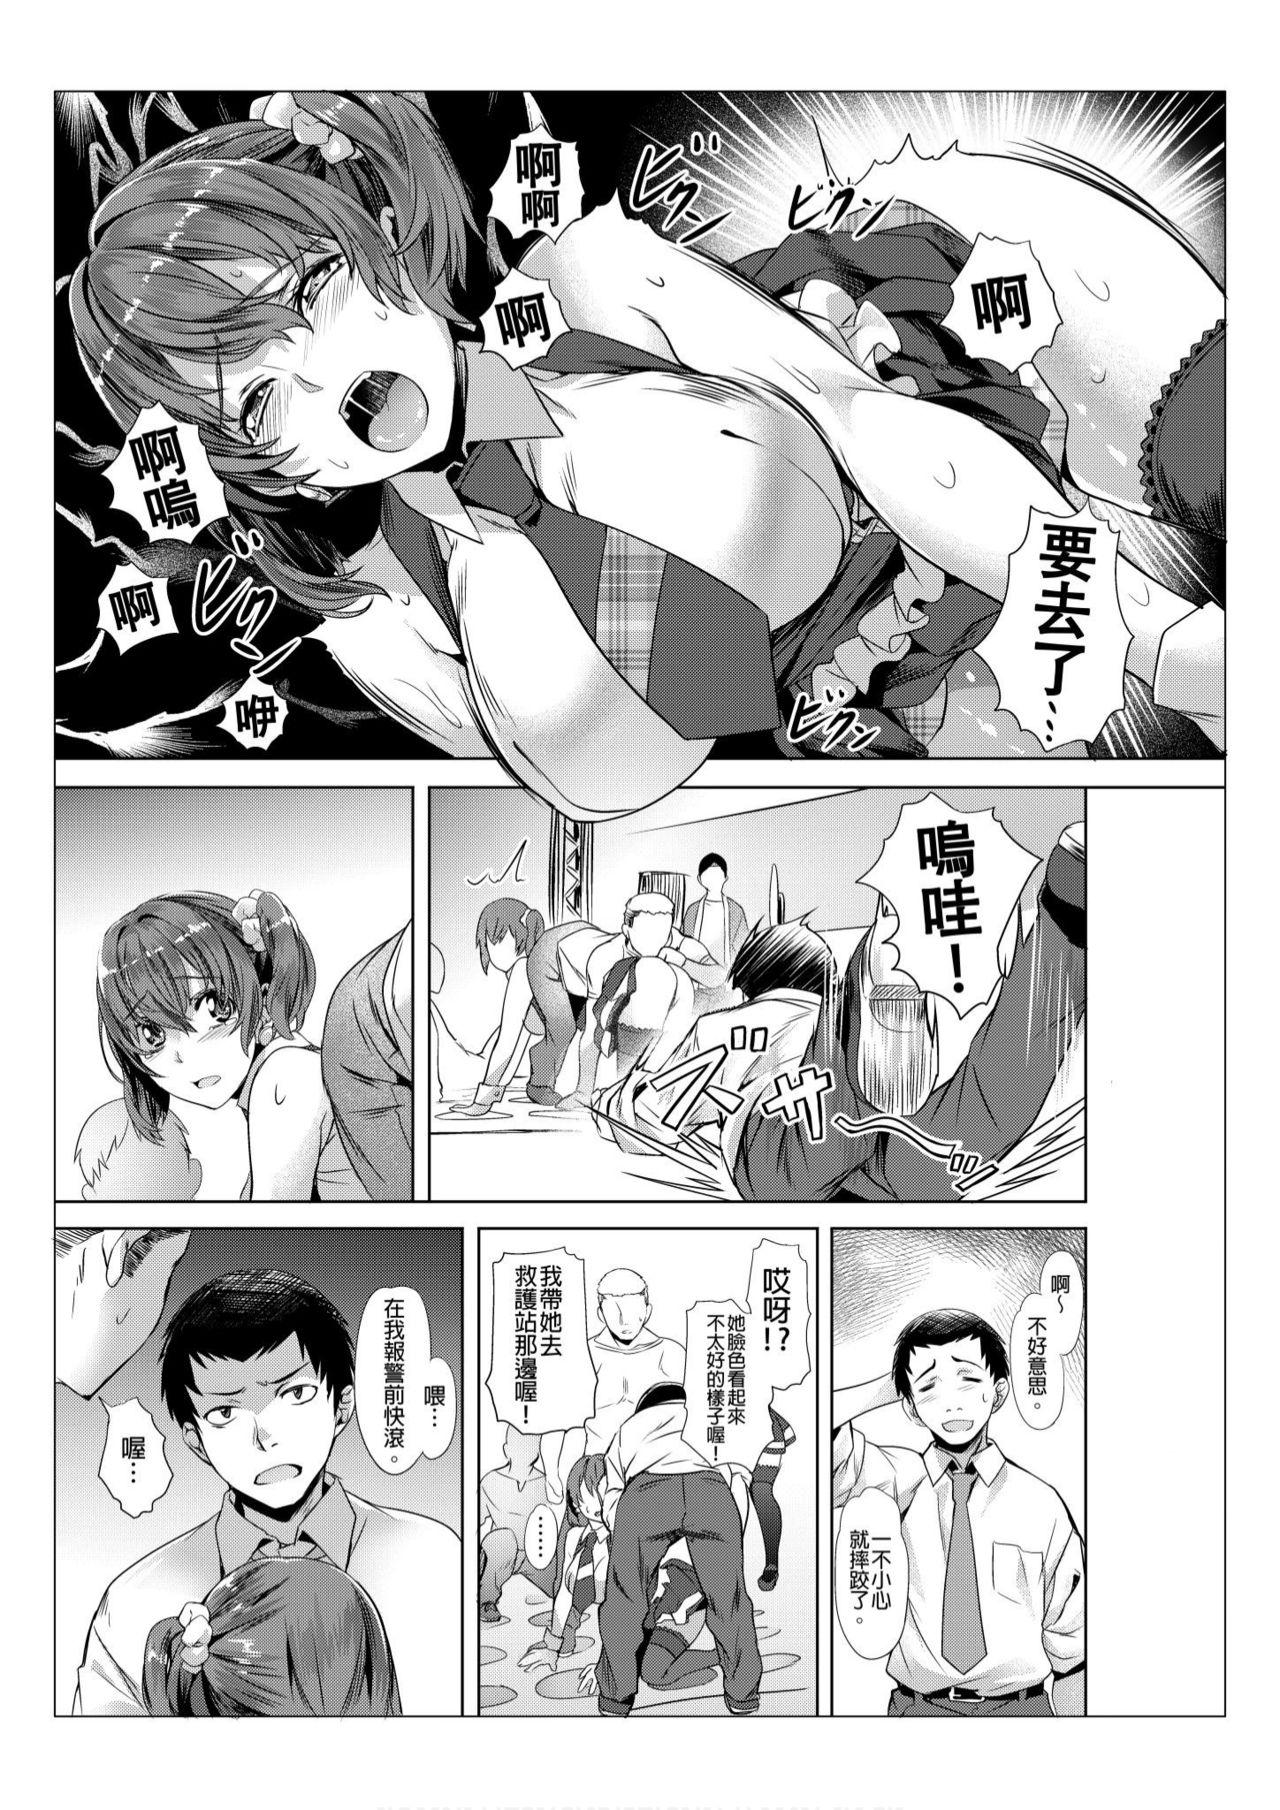 [Nagayori] Towel Ichimai de Otoko Buro.~ Shiranai Ojisan-tachi to Honiki Sex ~ | 只裹了條小毛巾就進男浴池的我。~被完全不認識的大叔們弄到高潮了~ [Chinese] [Decensored] 40